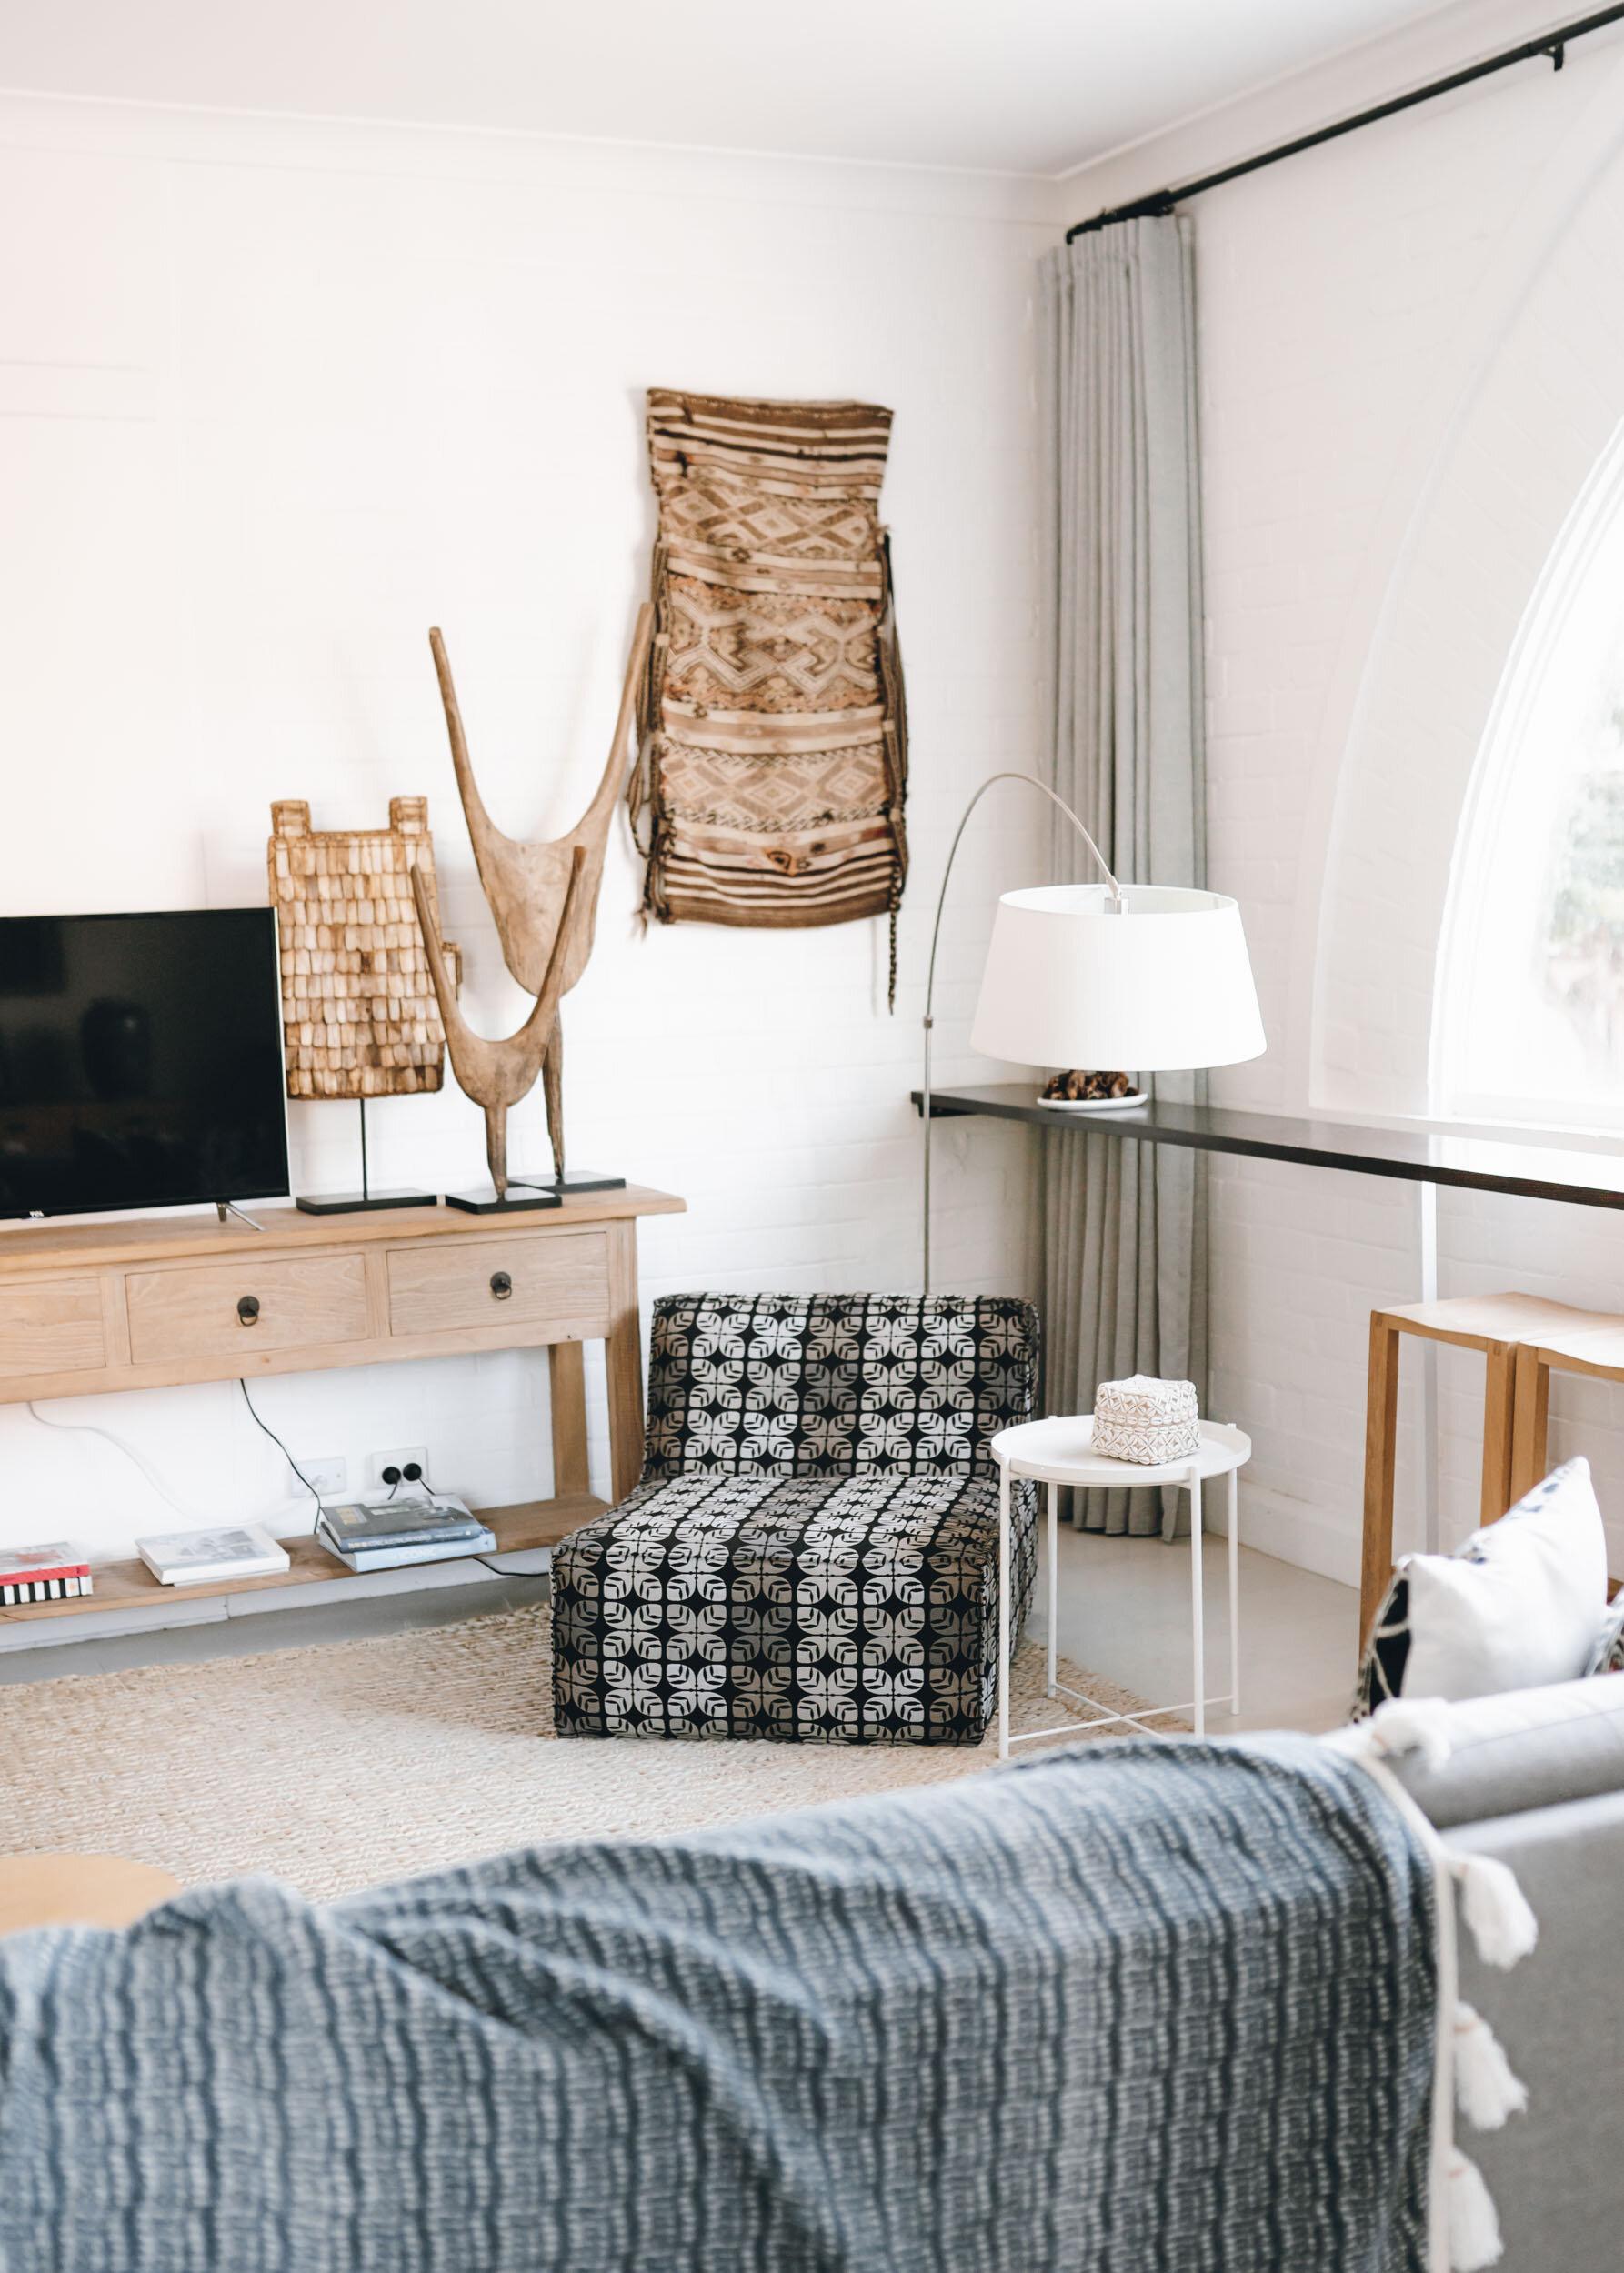 keira-mason-flourish-on-bull-street-interior-design.jpg